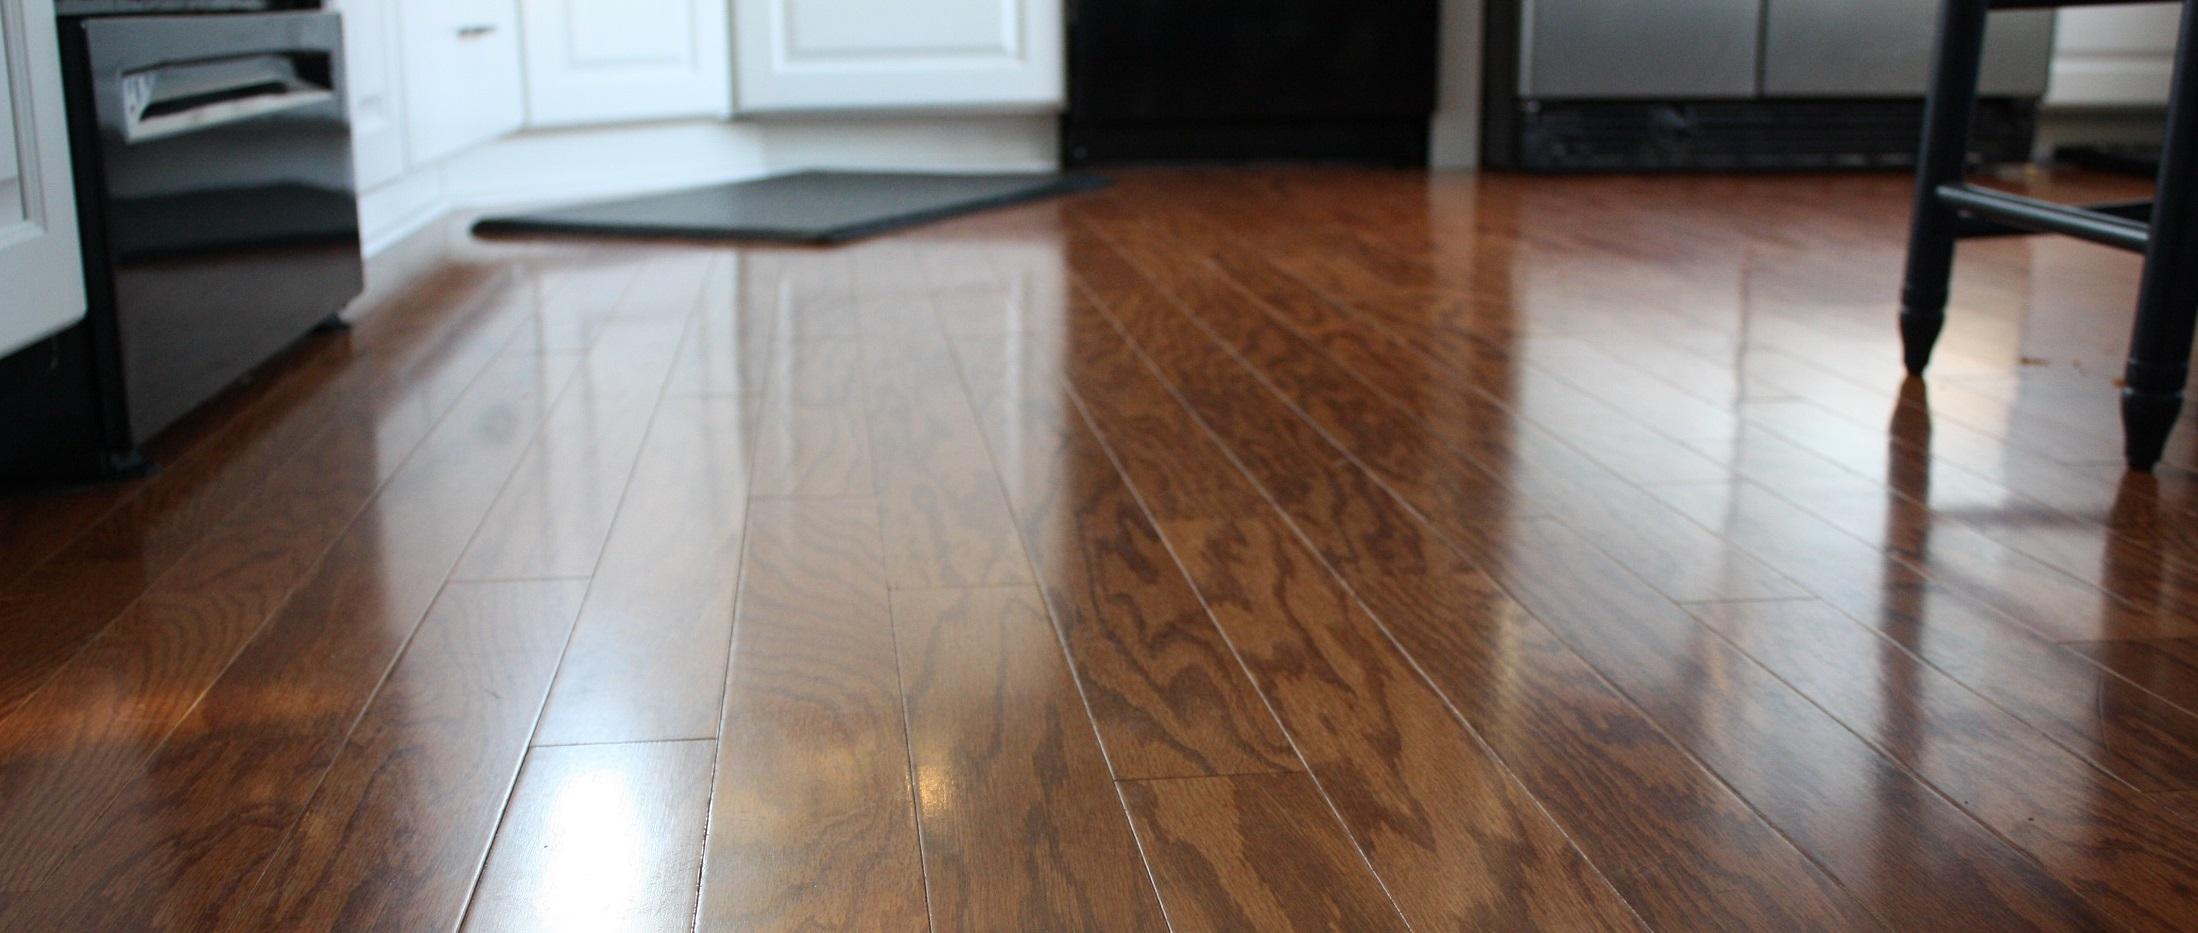 Hardwood floor cleaning service home design ideas and for Floor cleaning services